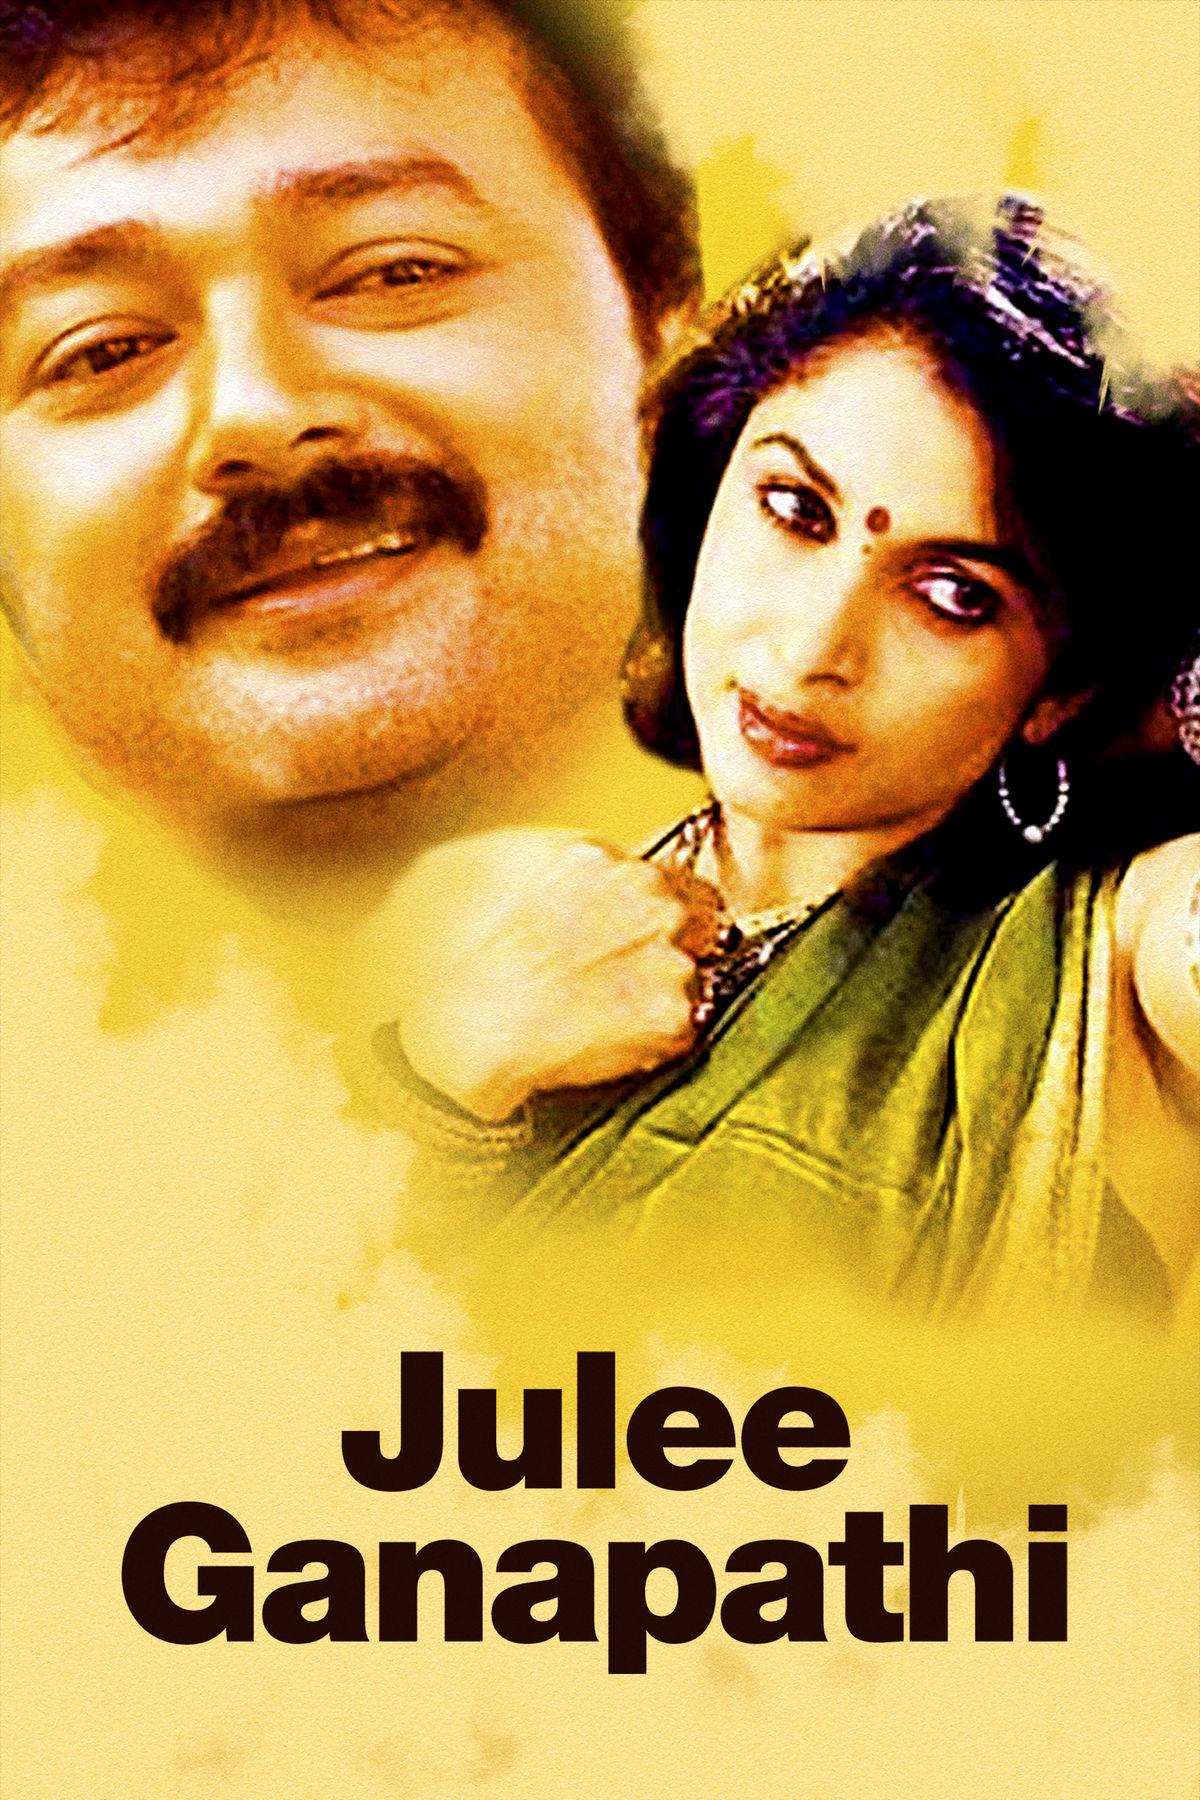 Julee Ganapathi